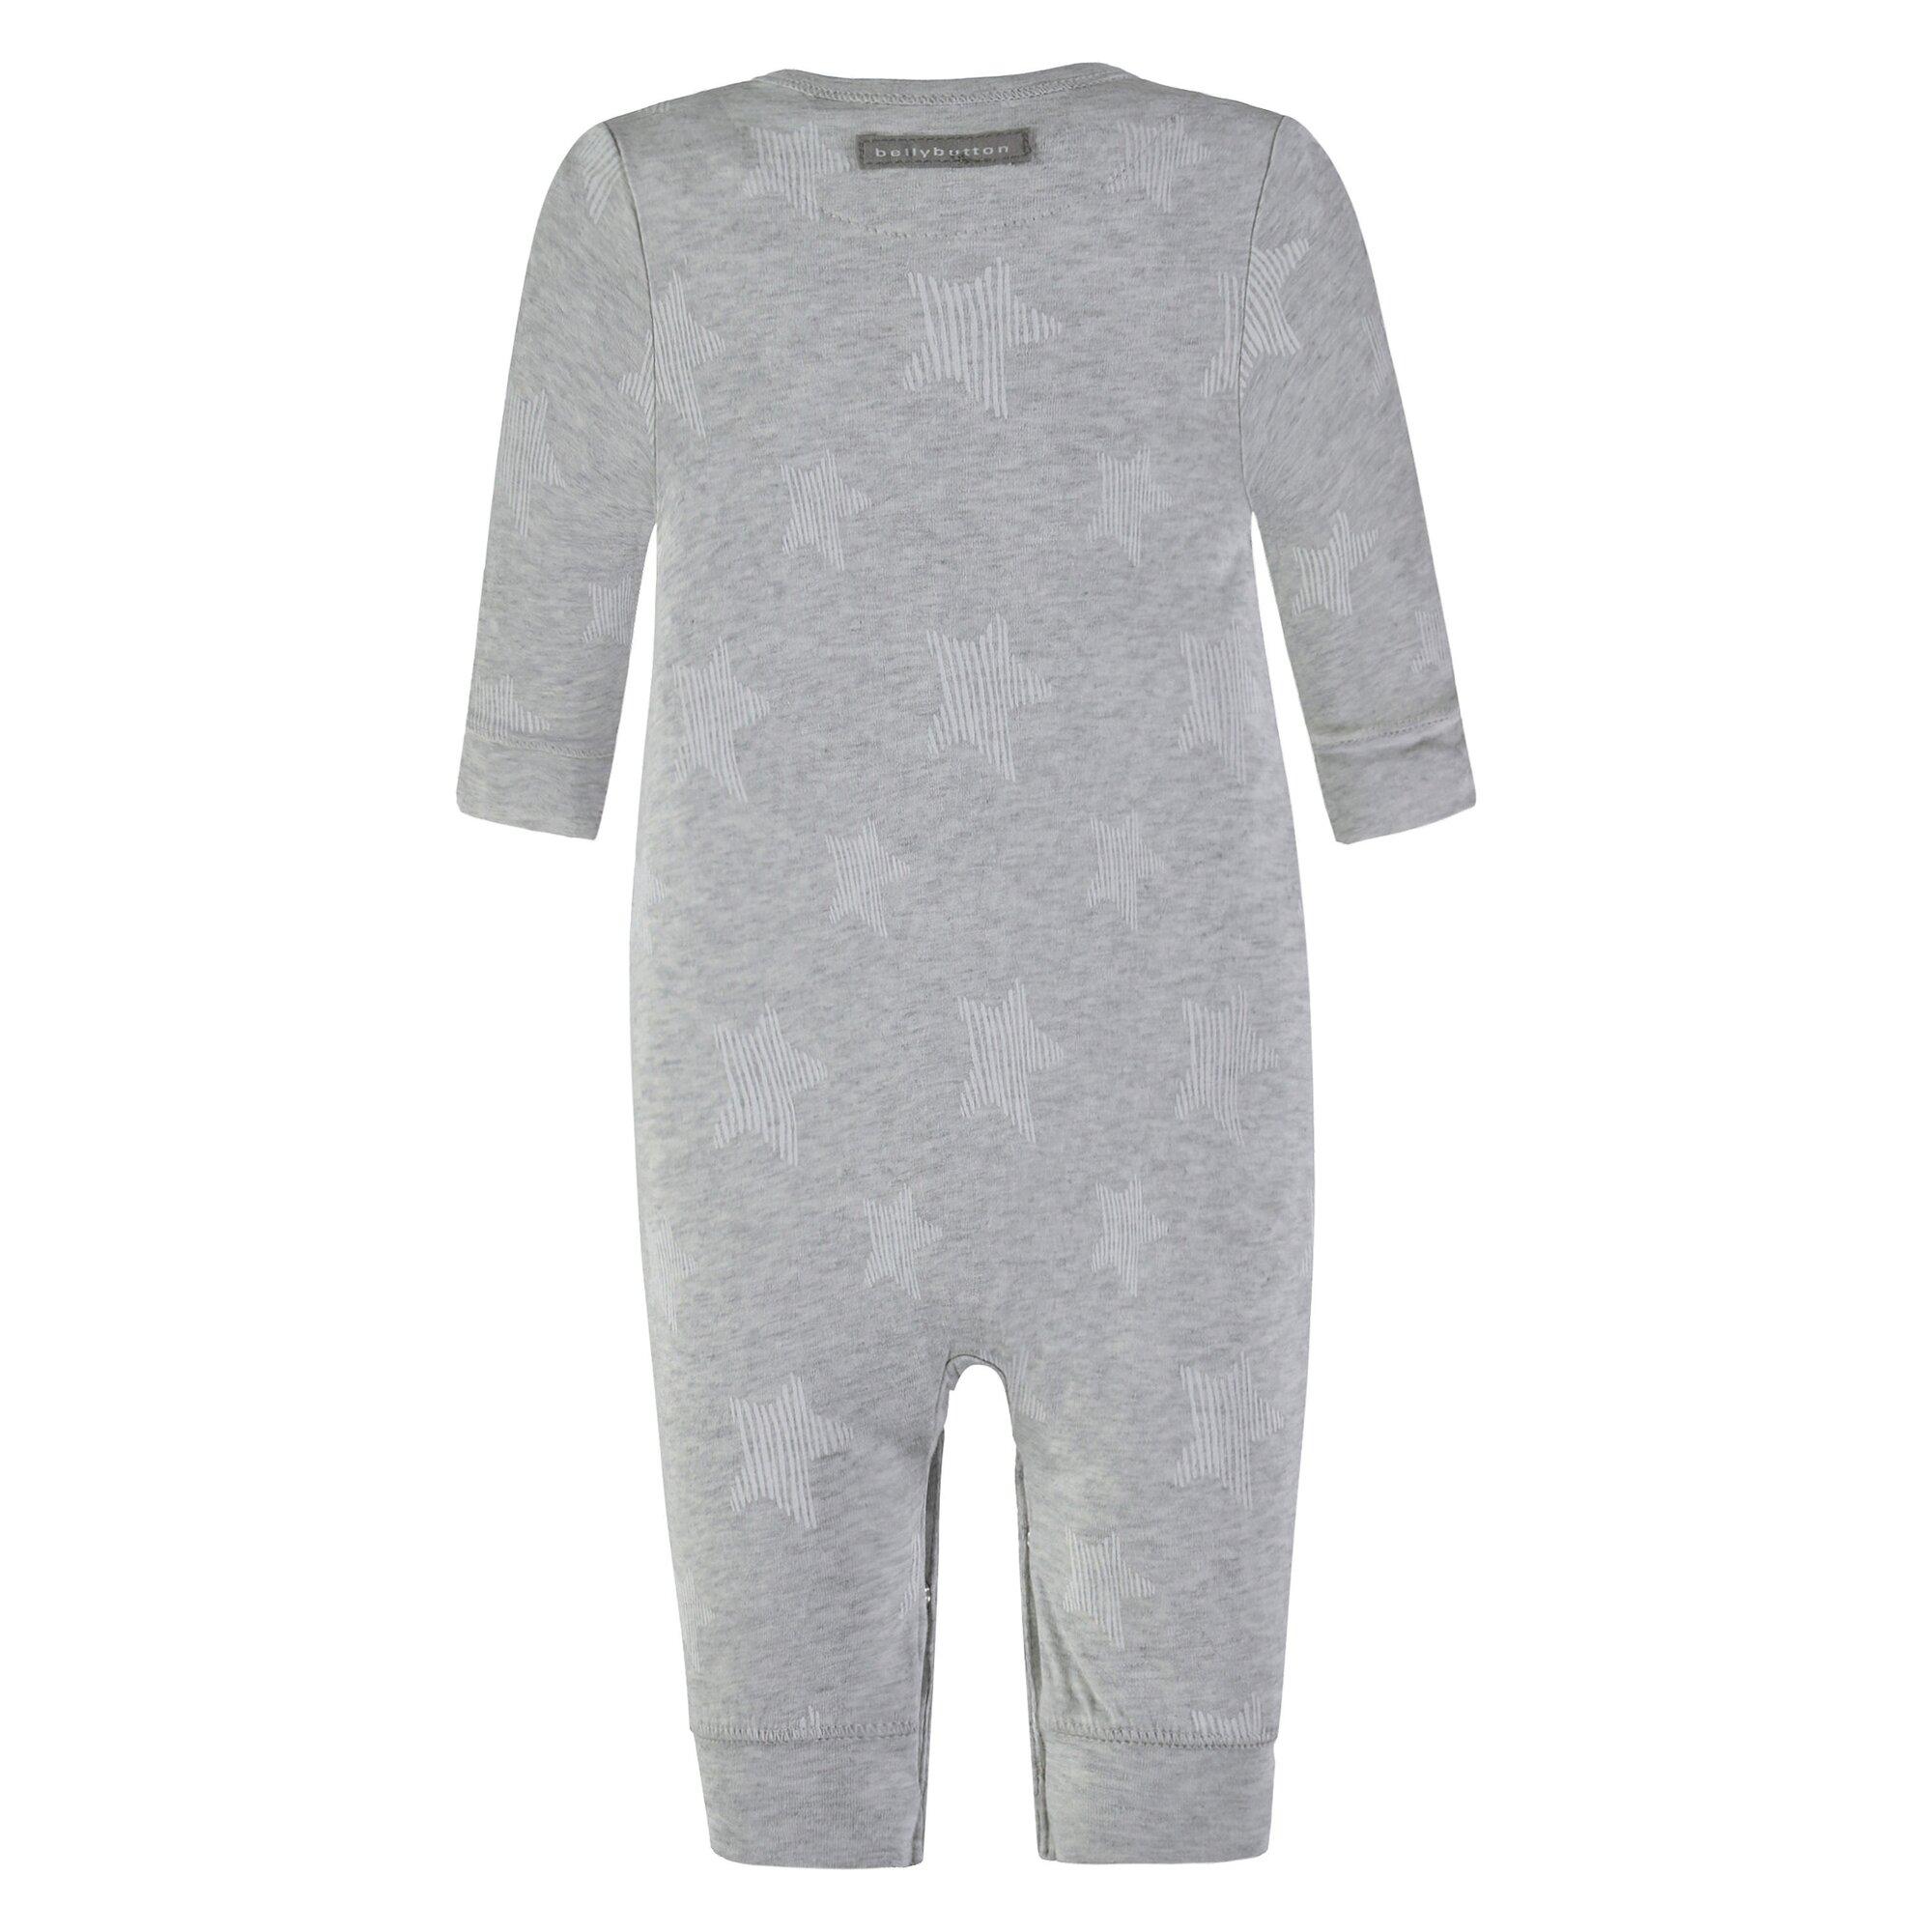 bellybutton-schlafanzug, 14.95 EUR @ babywalz-de